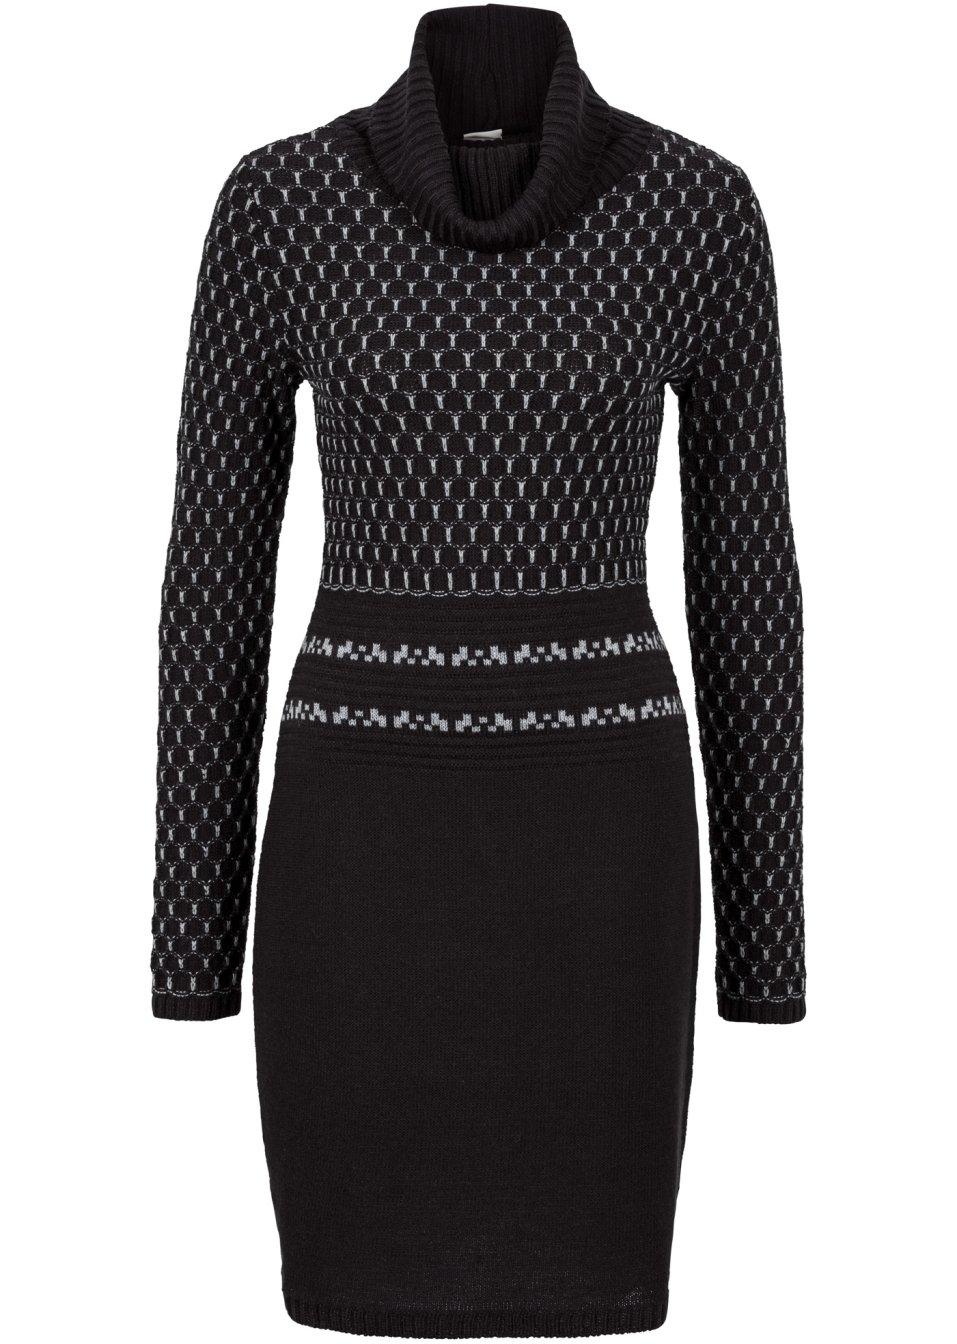 feminines langarm strickkleid mit rollkragen schwarz grau. Black Bedroom Furniture Sets. Home Design Ideas